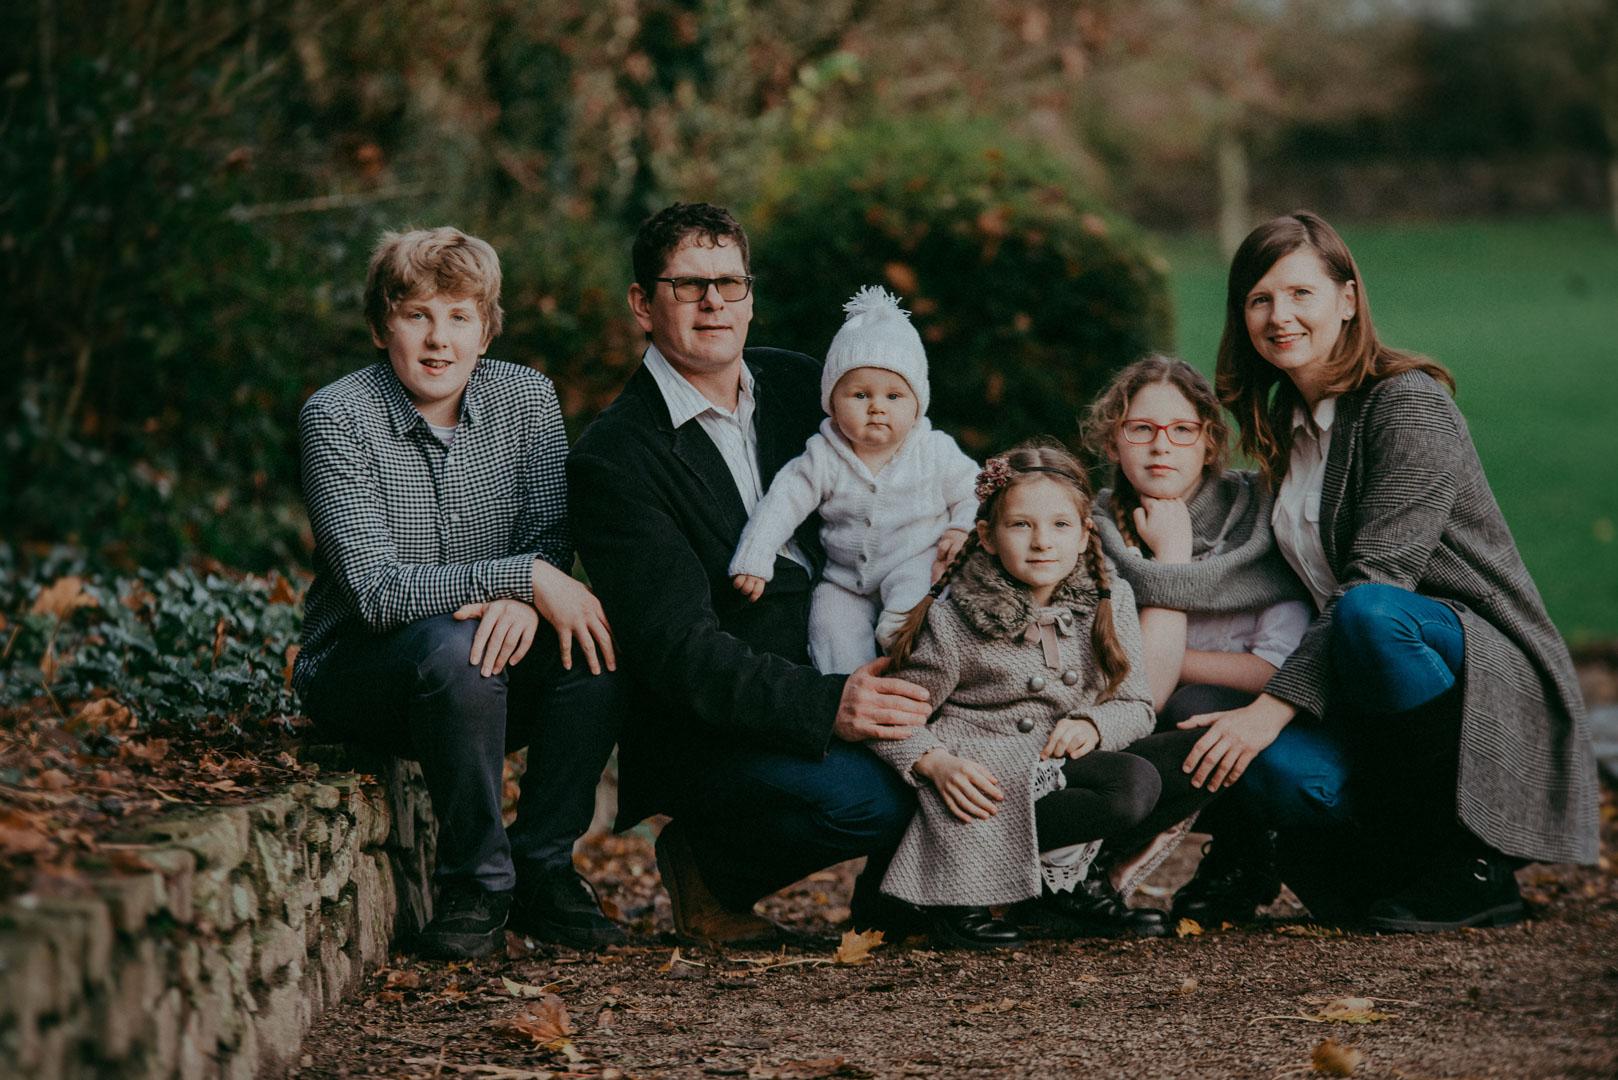 Iza and Her Family